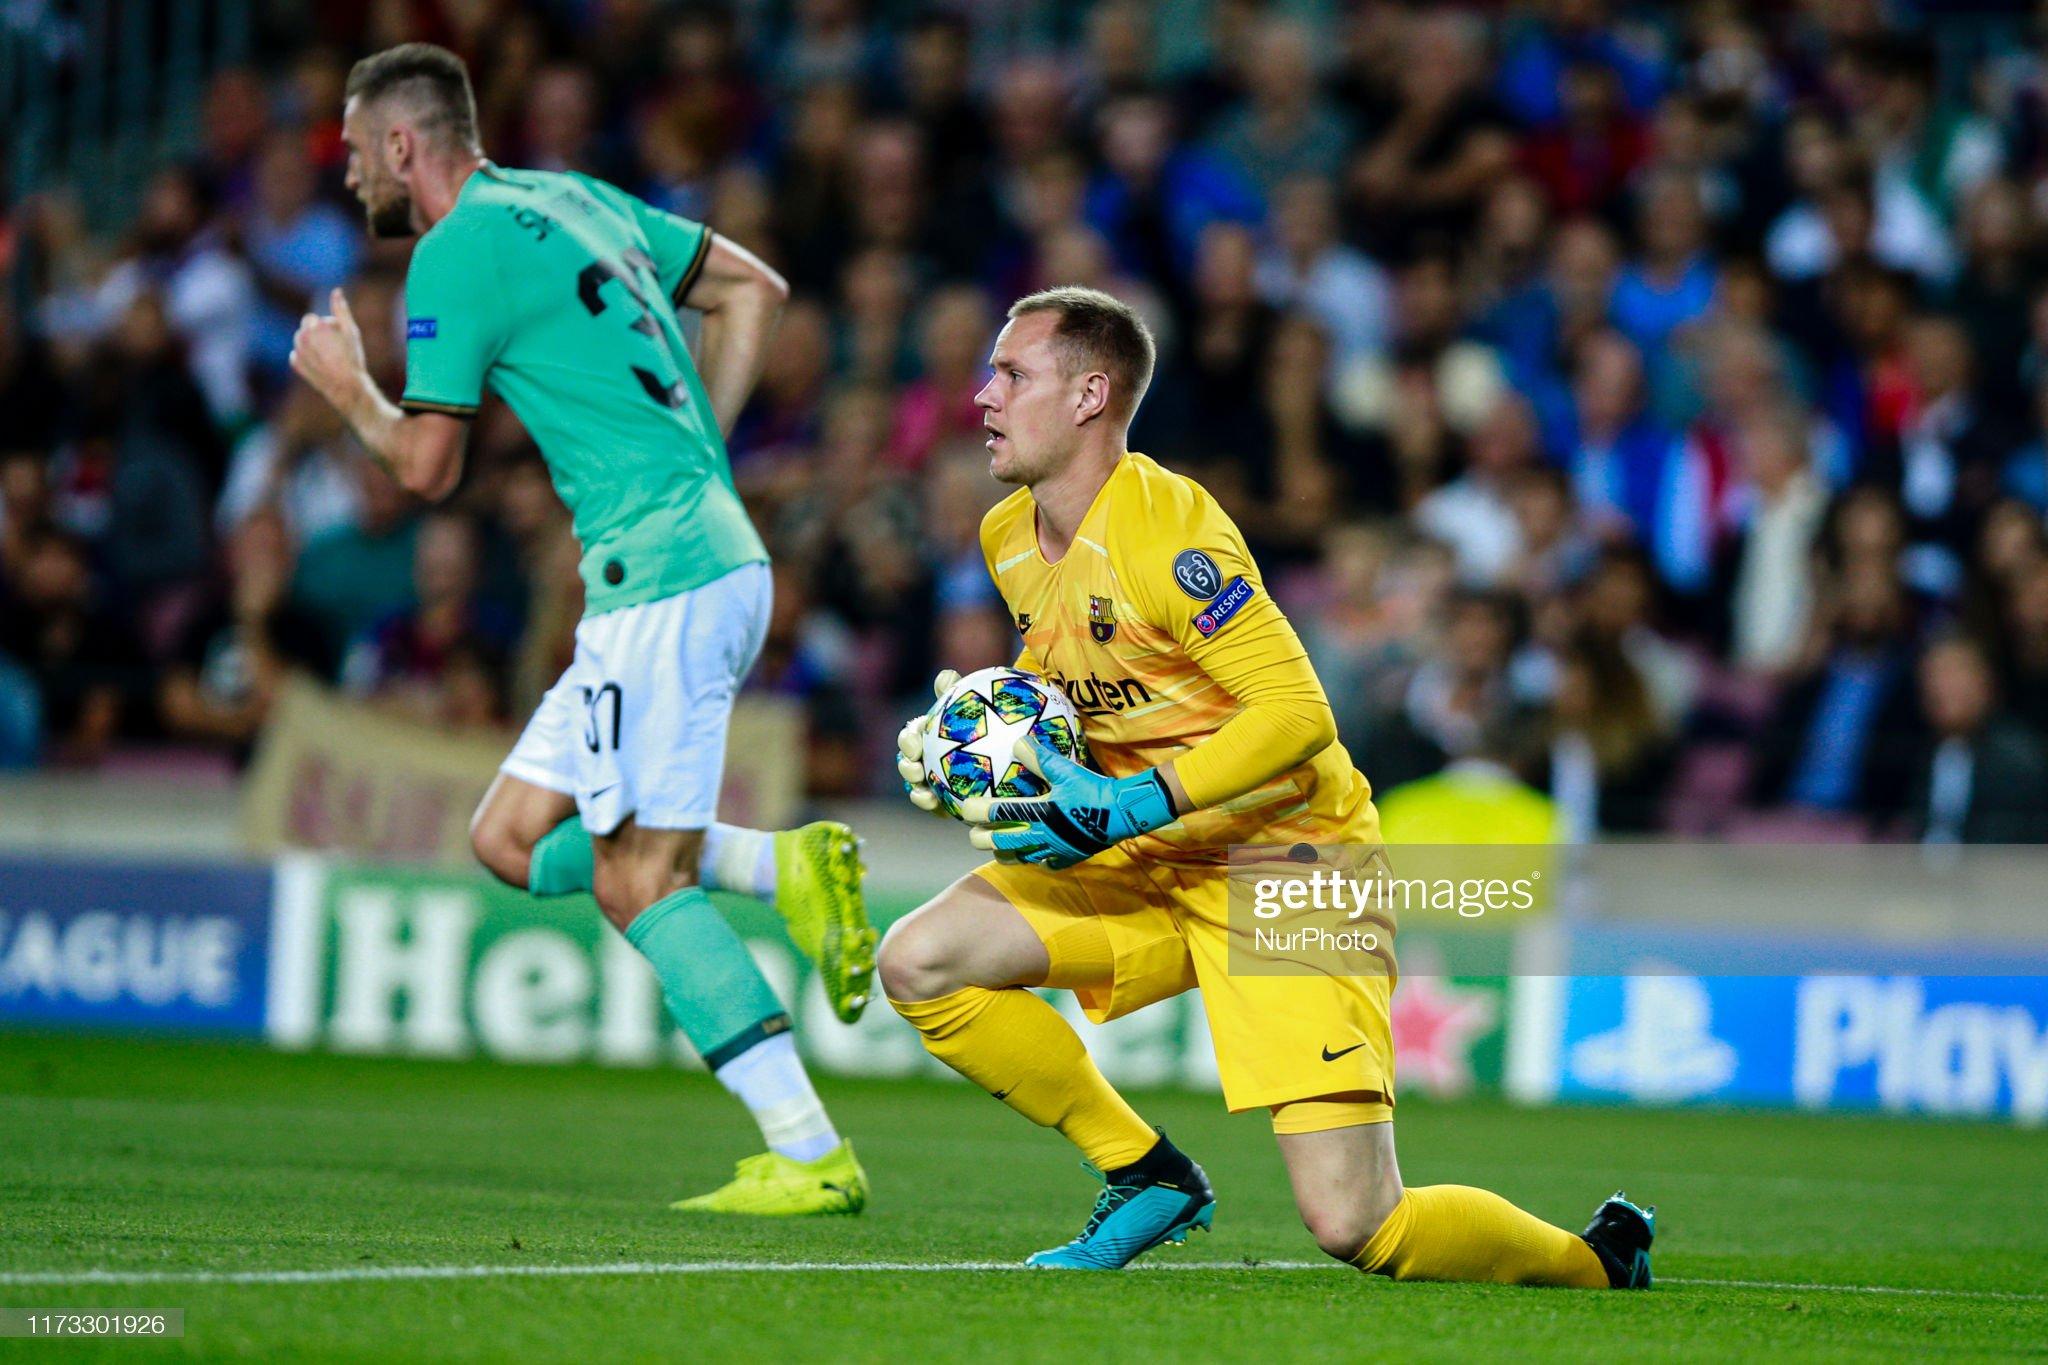 صور مباراة : برشلونة - إنتر 2-1 ( 02-10-2019 )  Ter-stegen-from-germany-of-fc-barcelona-during-the-uefa-champions-picture-id1173301926?s=2048x2048